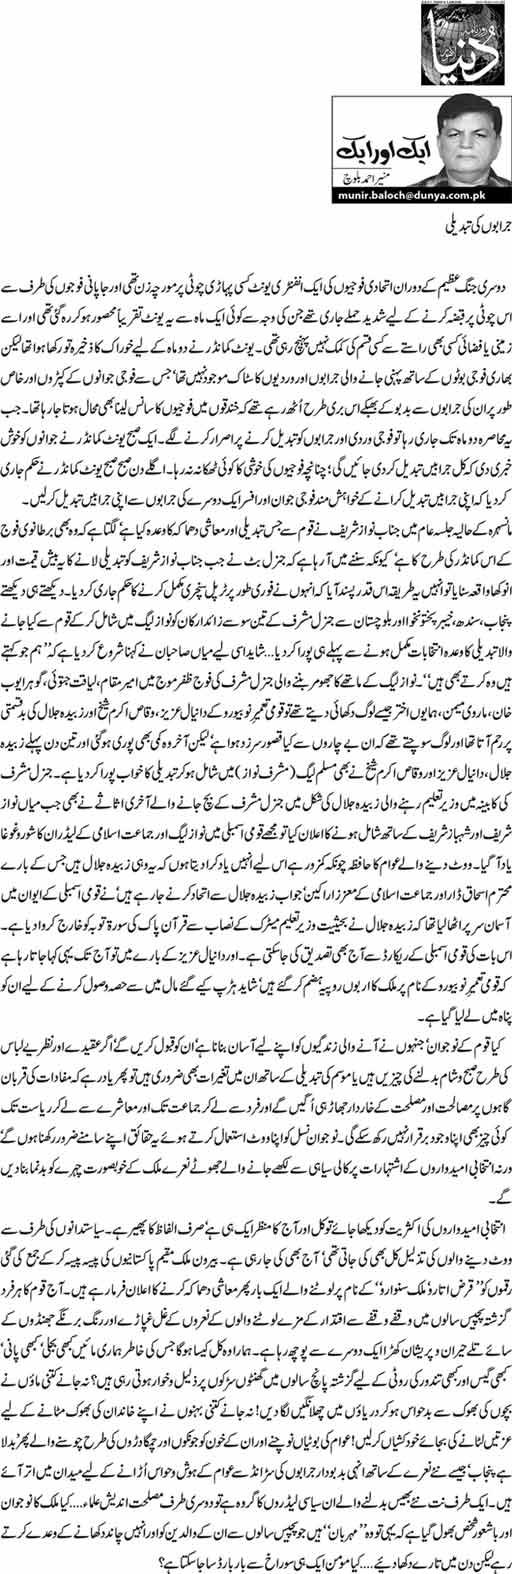 Jurabon Ki Tabdeeli - Munir Ahmed Baloch